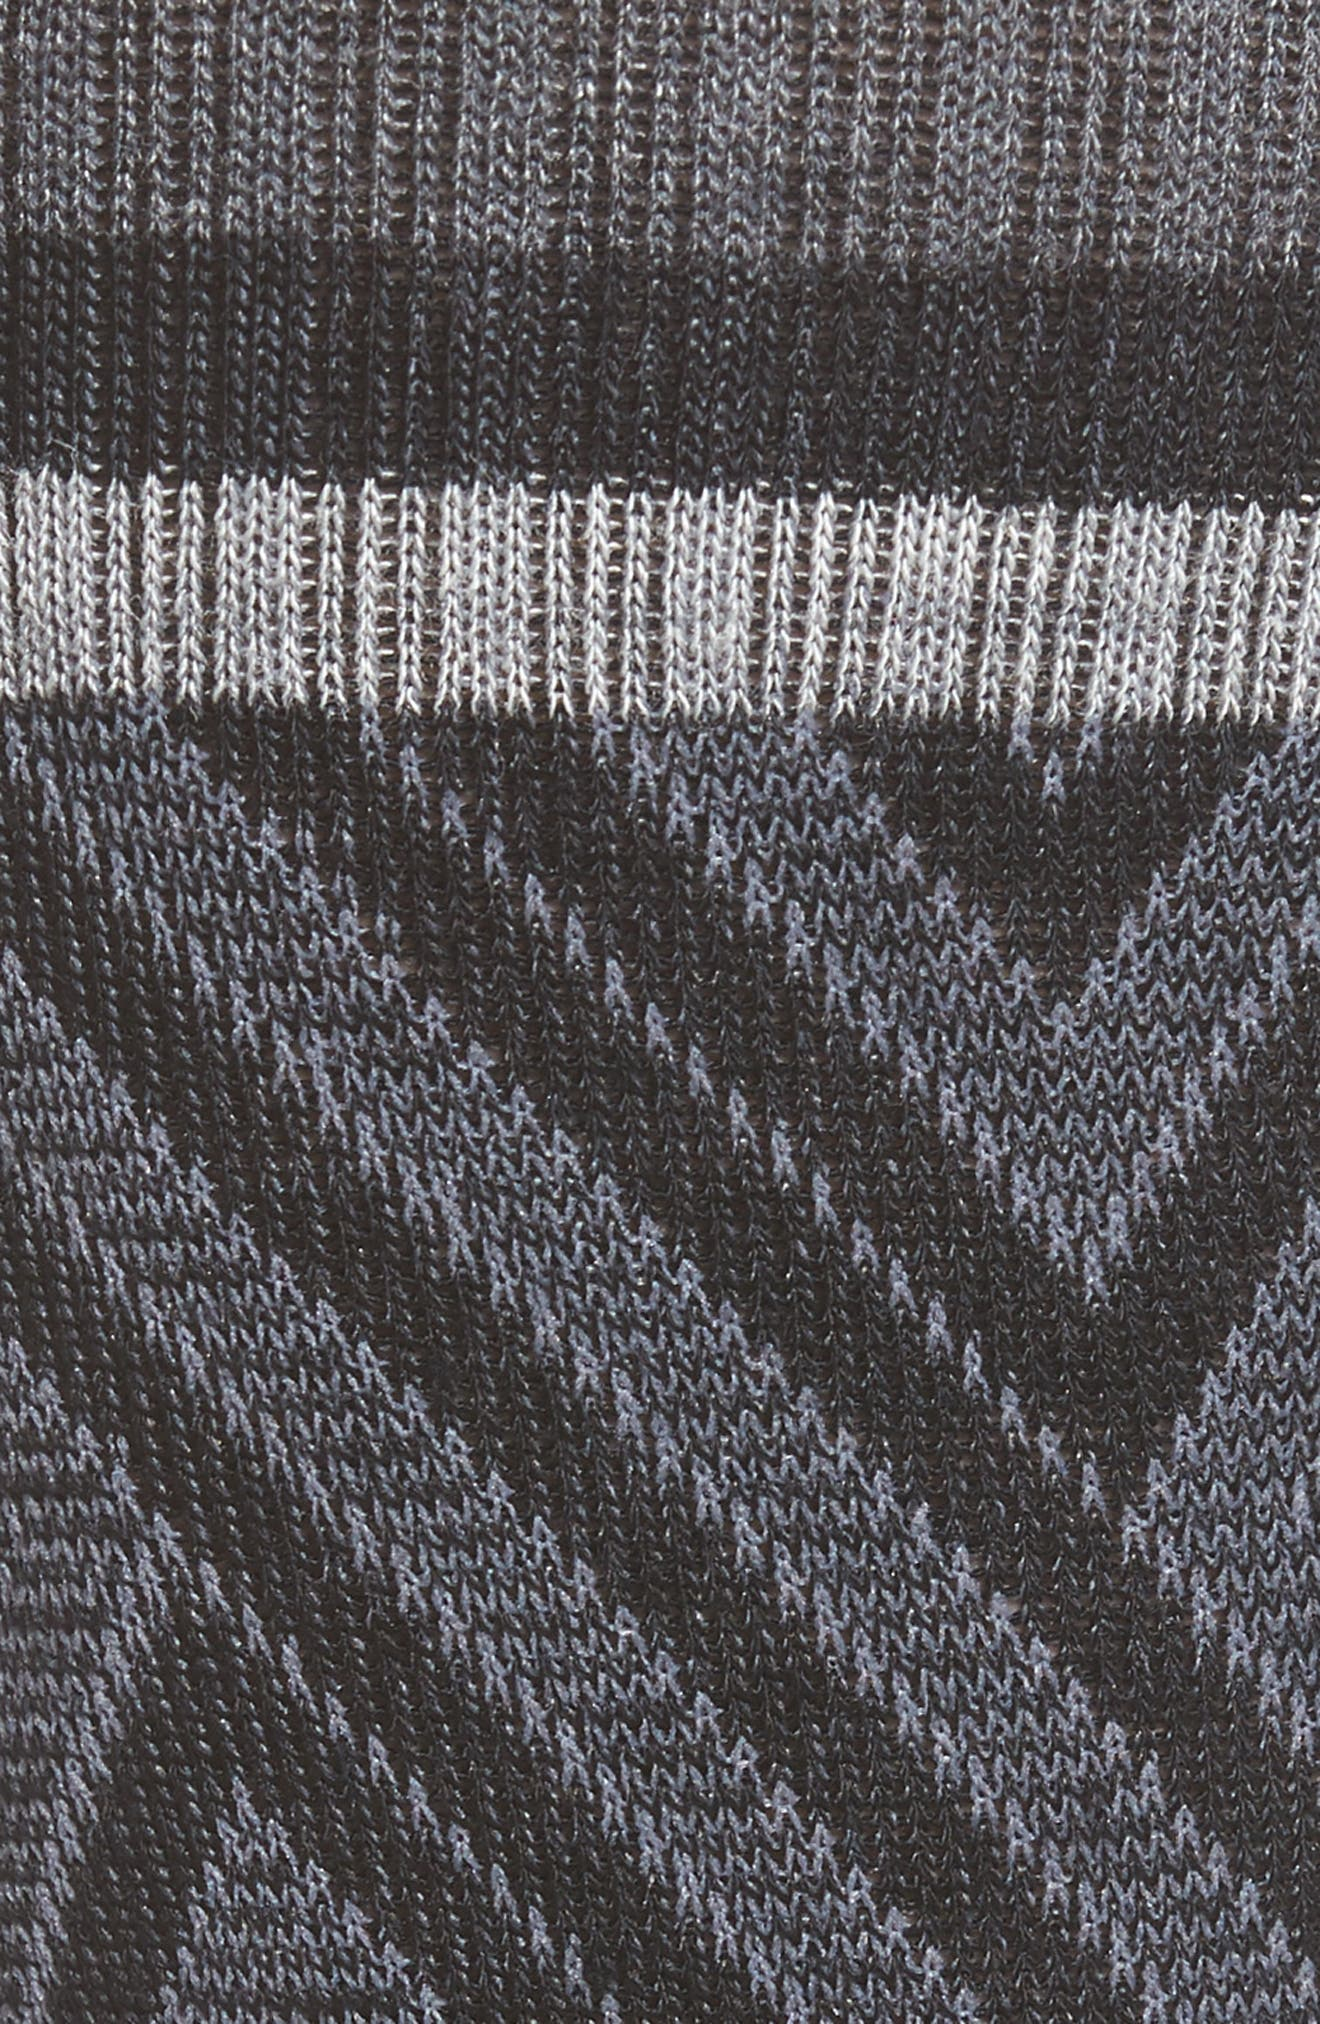 Labyrinth Graduated Compression Socks,                             Alternate thumbnail 2, color,                             001